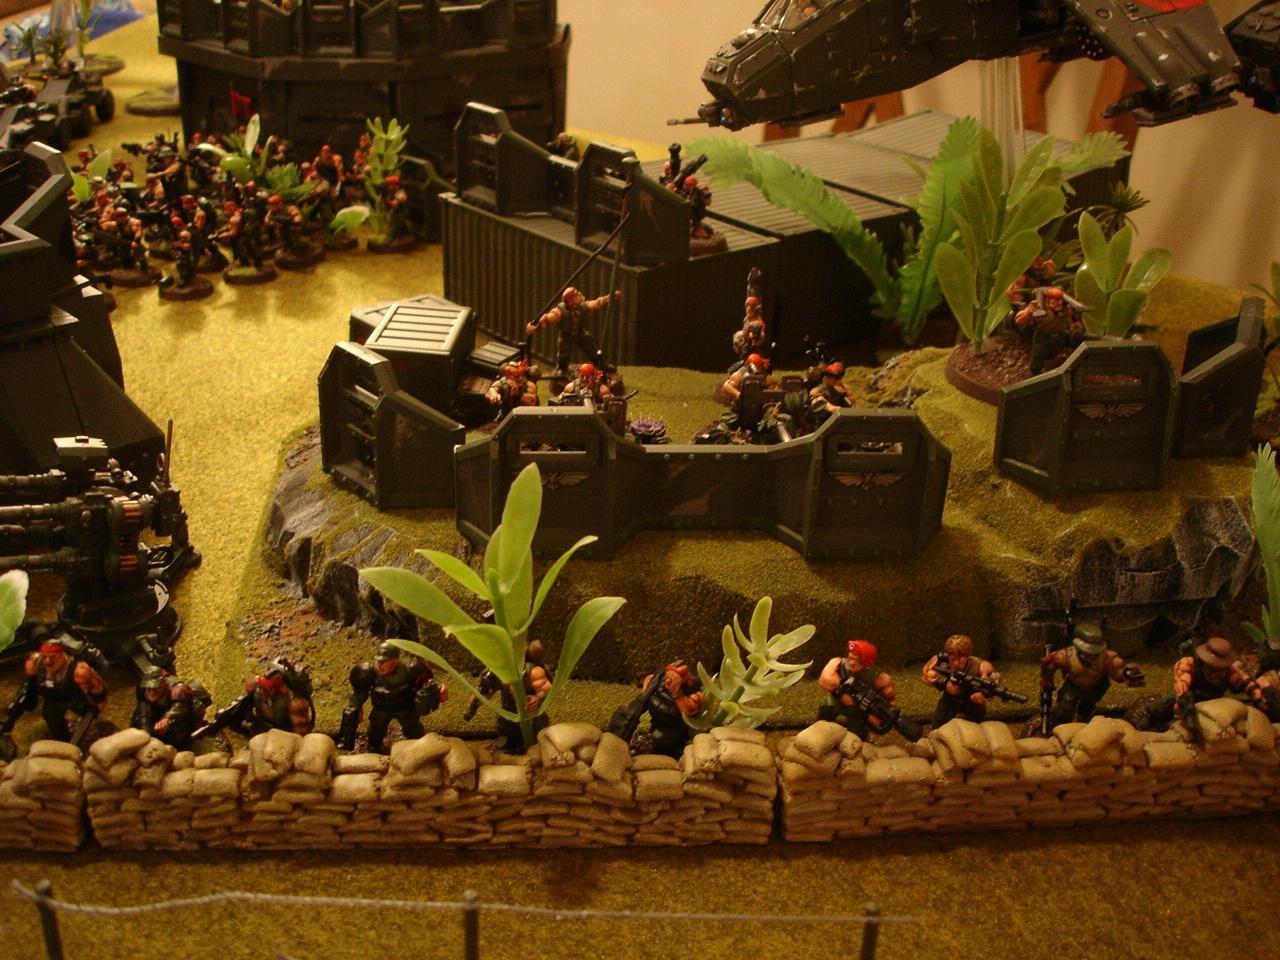 Catachan, Imperial Guard, Warhammer 40,000, Warhammer Fantasy